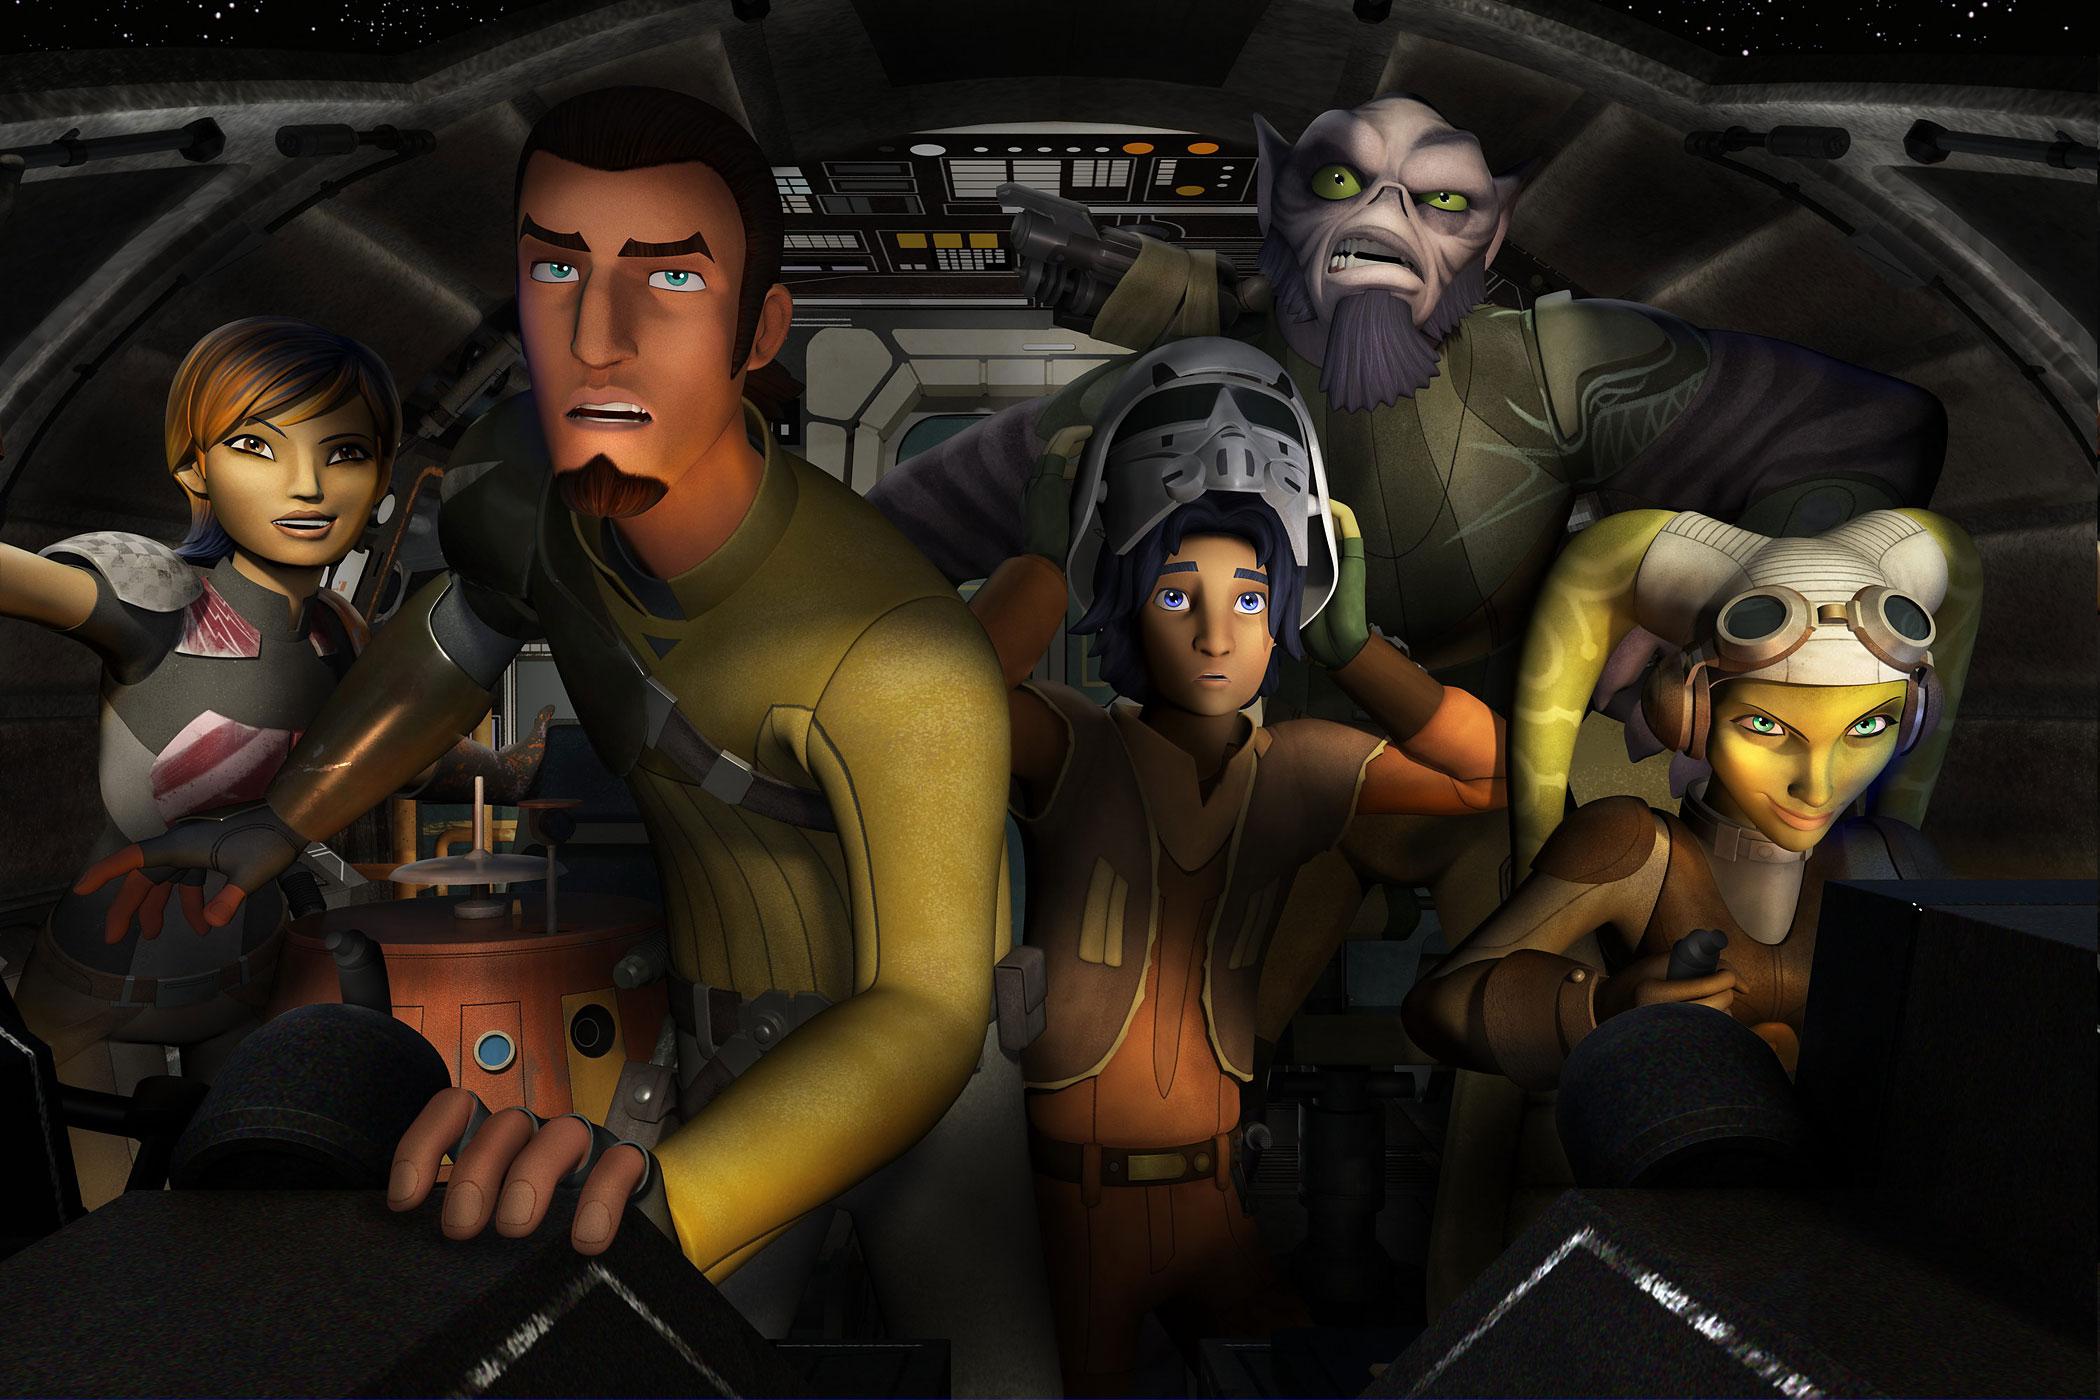 Star Wars: Rebels - Ezra Bridger by KikiRDCZ on DeviantArt